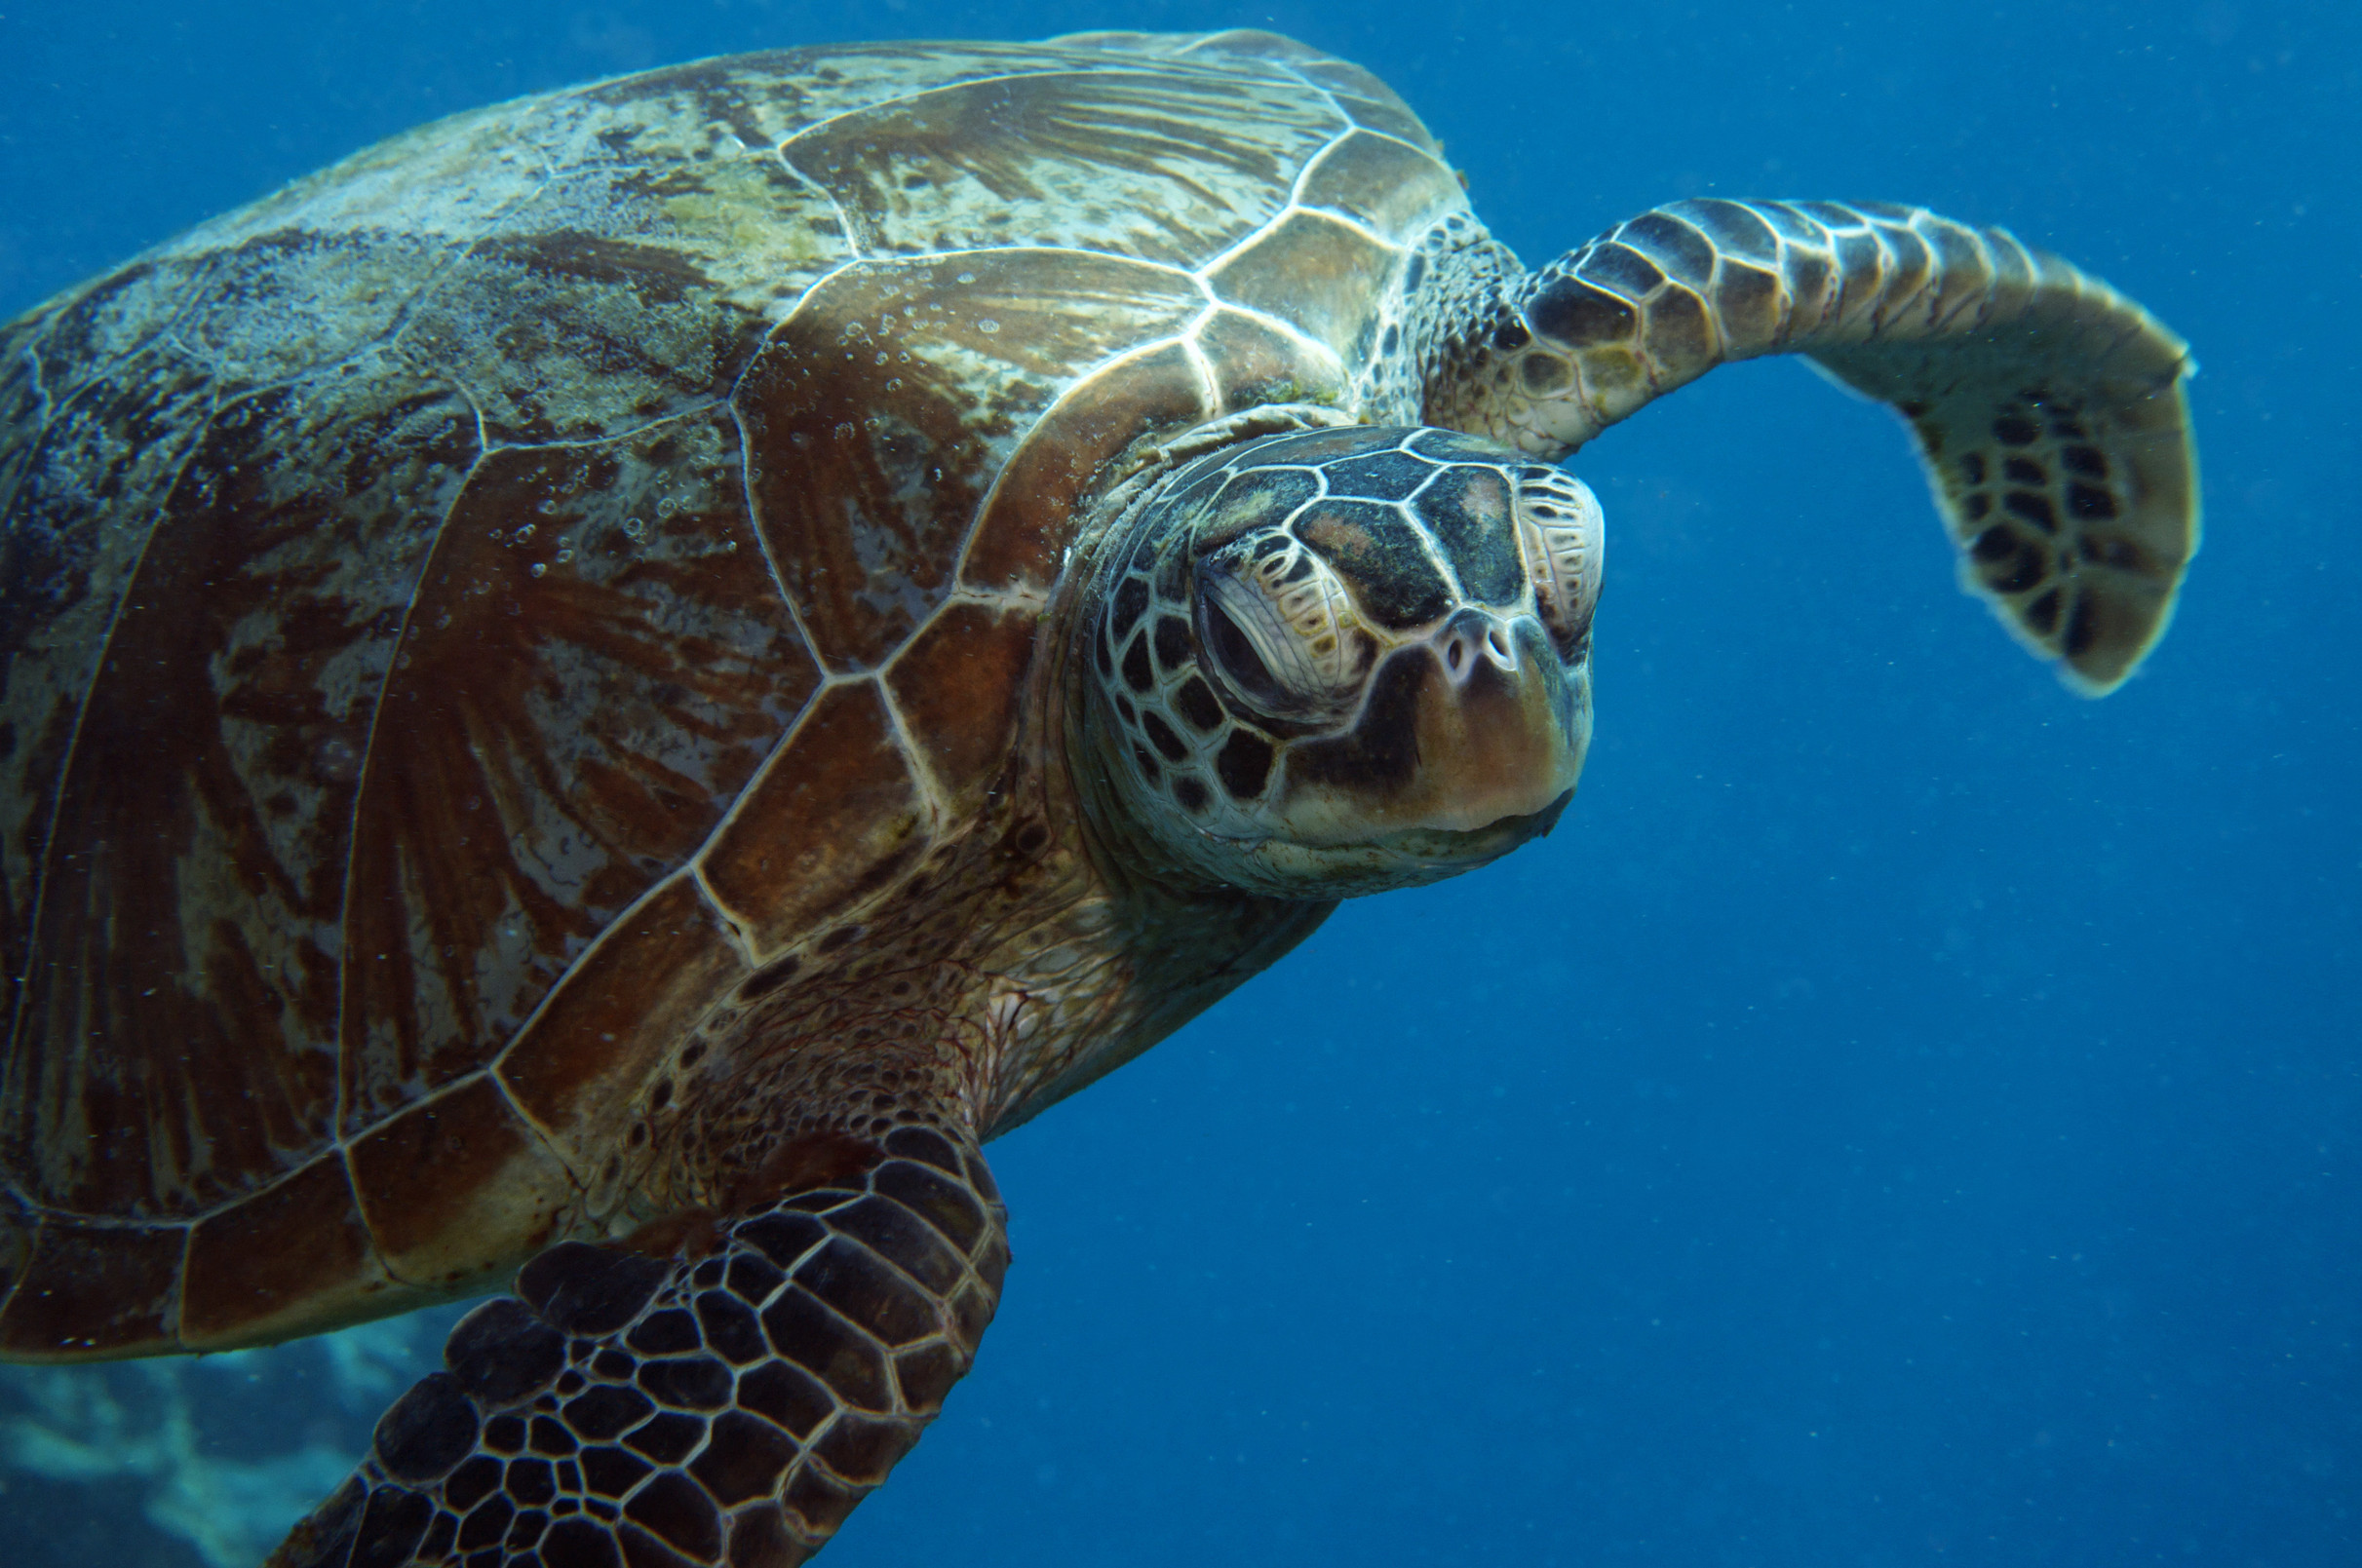 Turtle Wasserschildkröte Great Barrier Reef Queensland Australien